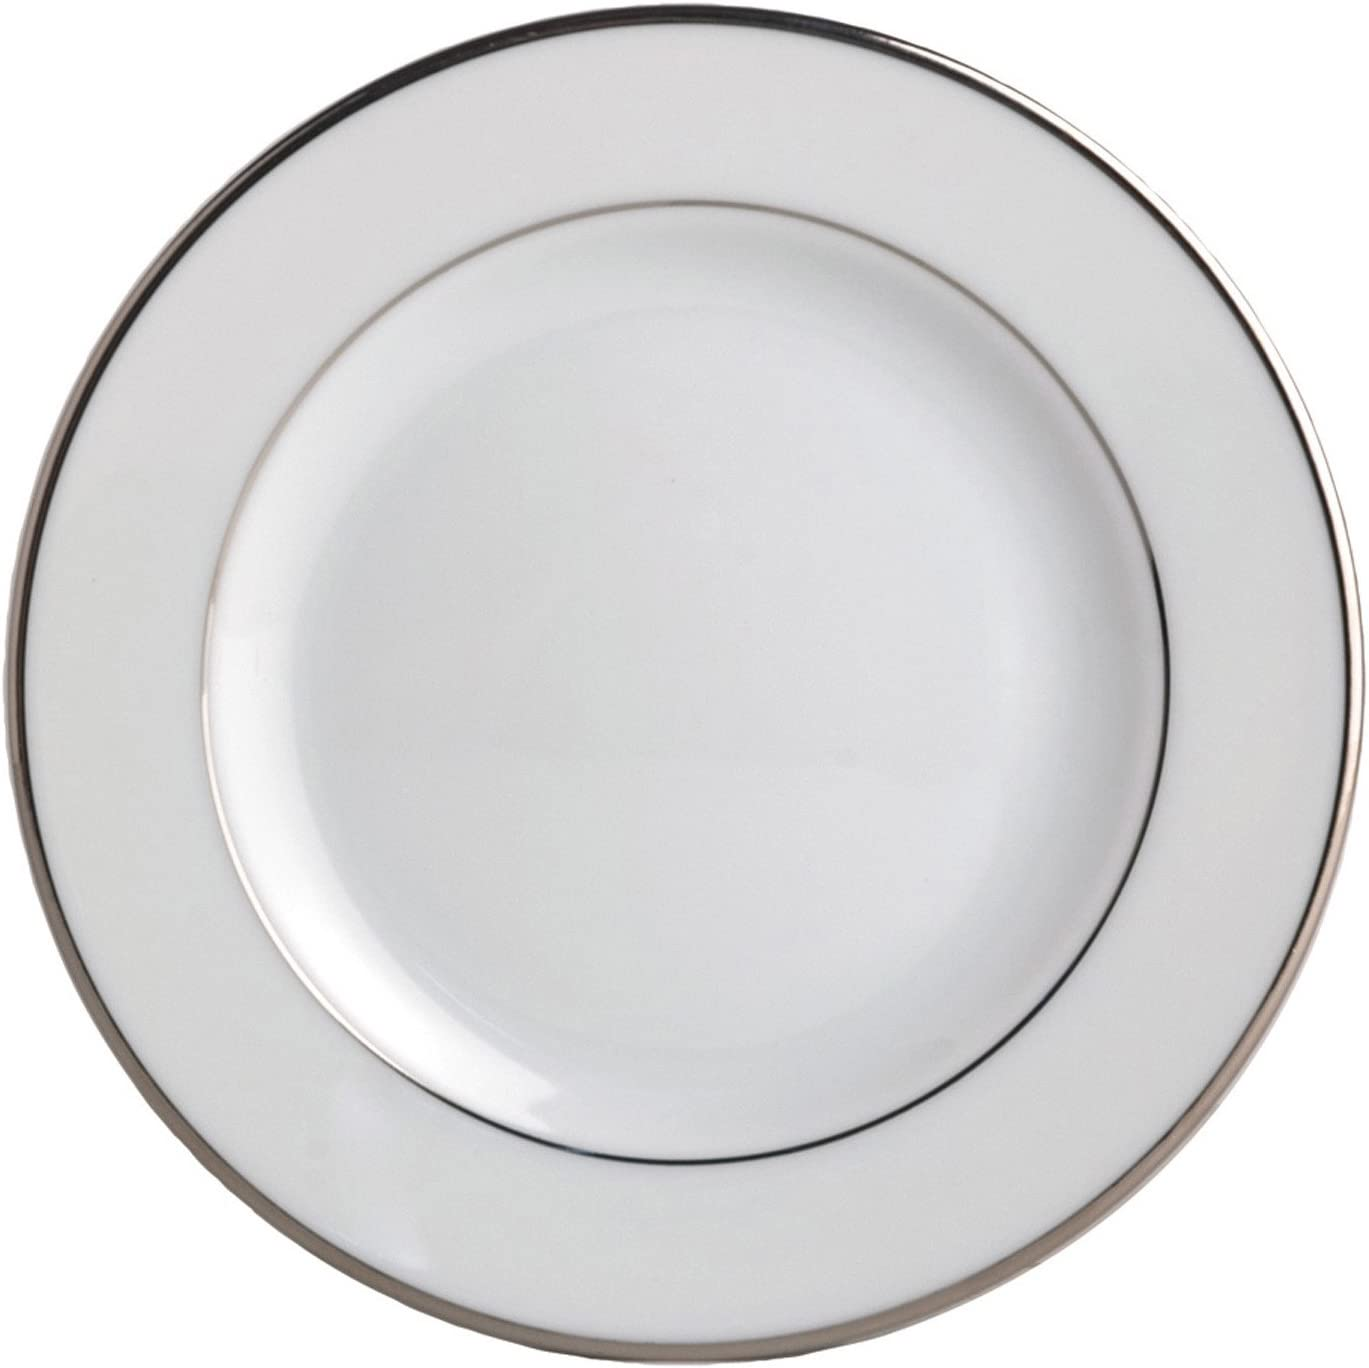 Bernardaud Cristal Bread Plate Butter Popular popular Product